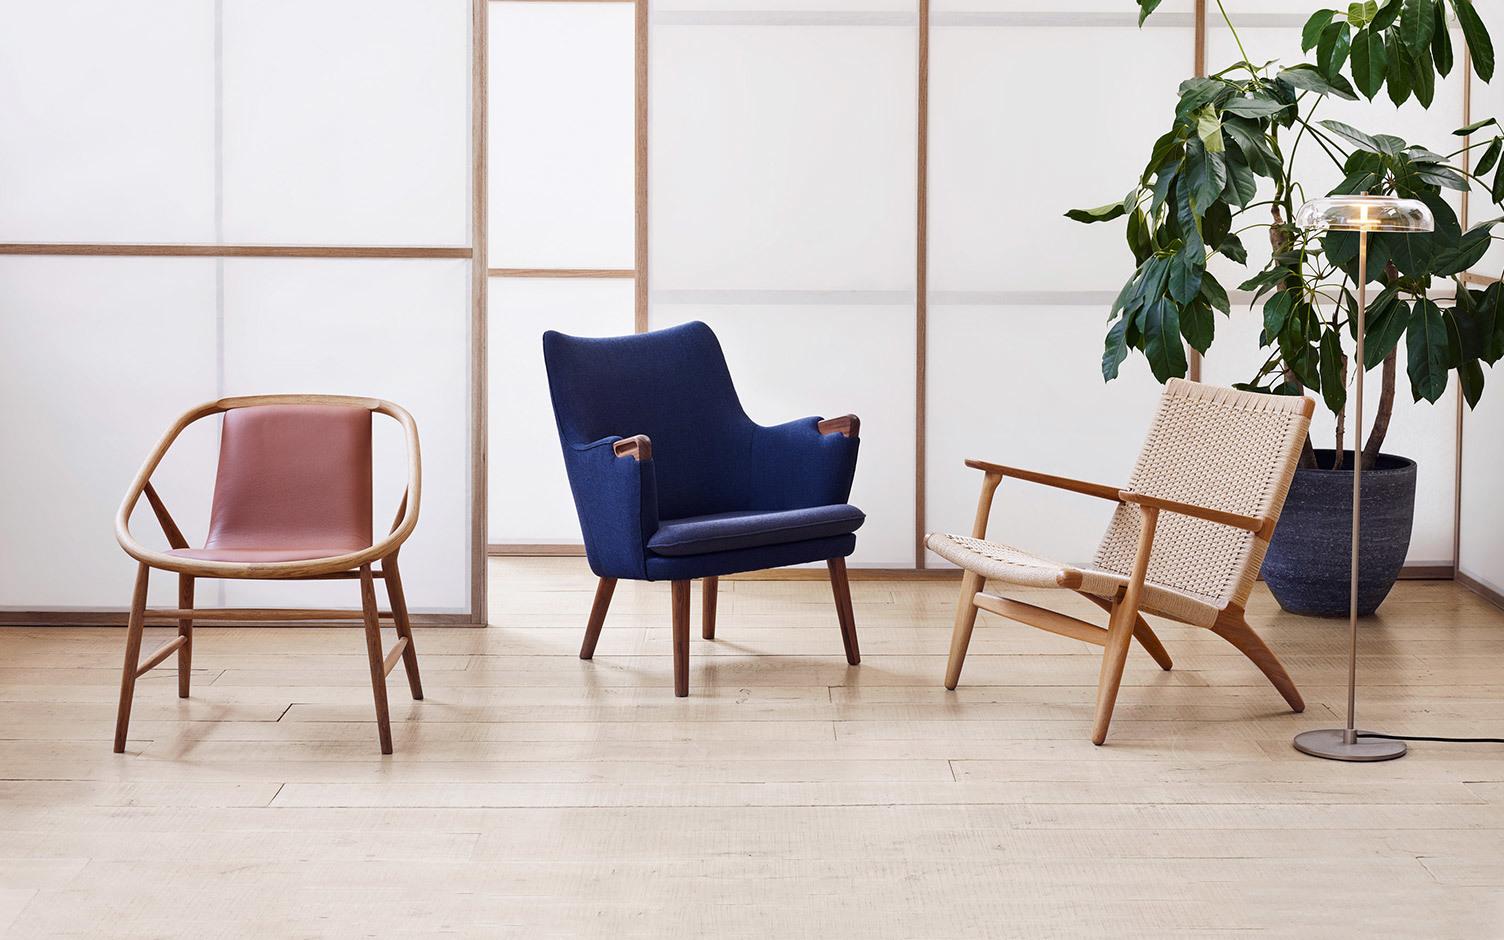 Lounge Chairs catalogue image